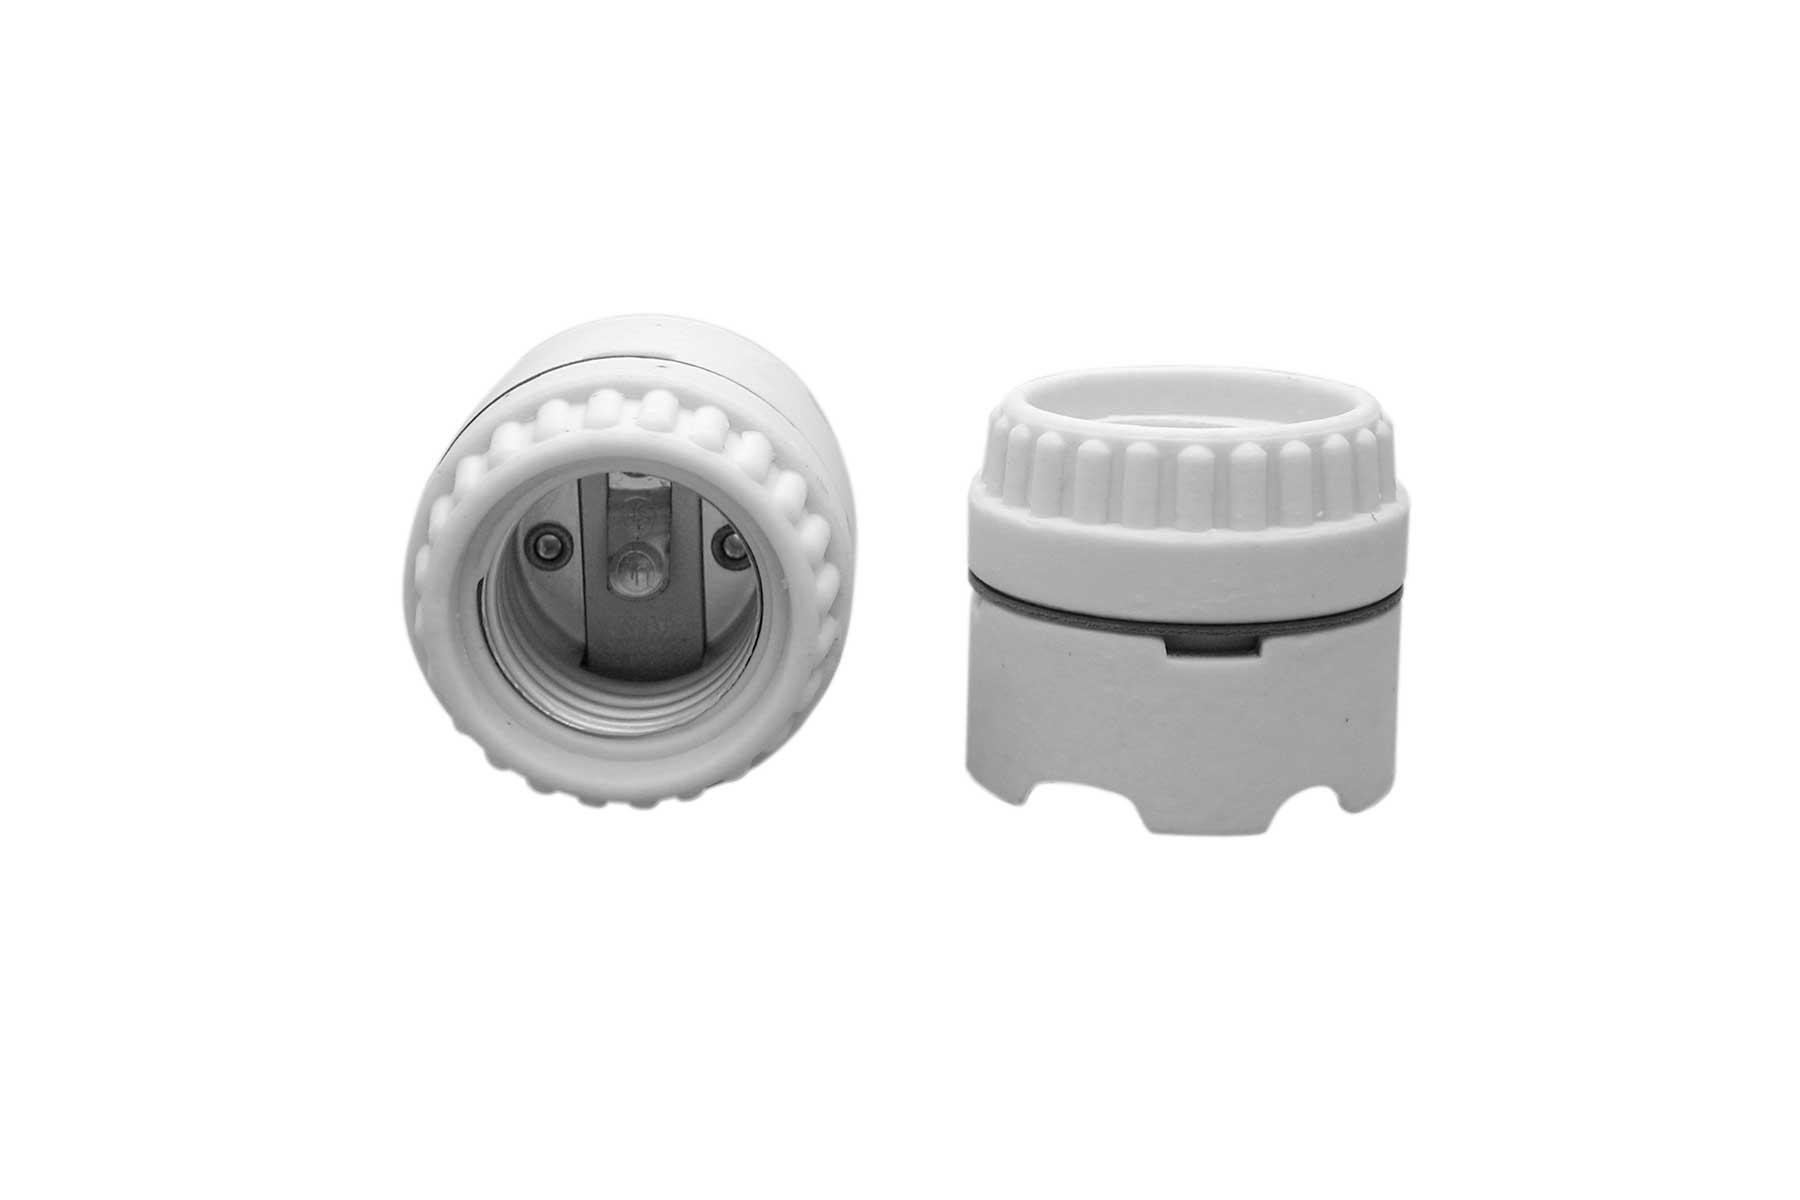 Porcelain Keyless Sign Incandescent Light Socket with Screw Terminals